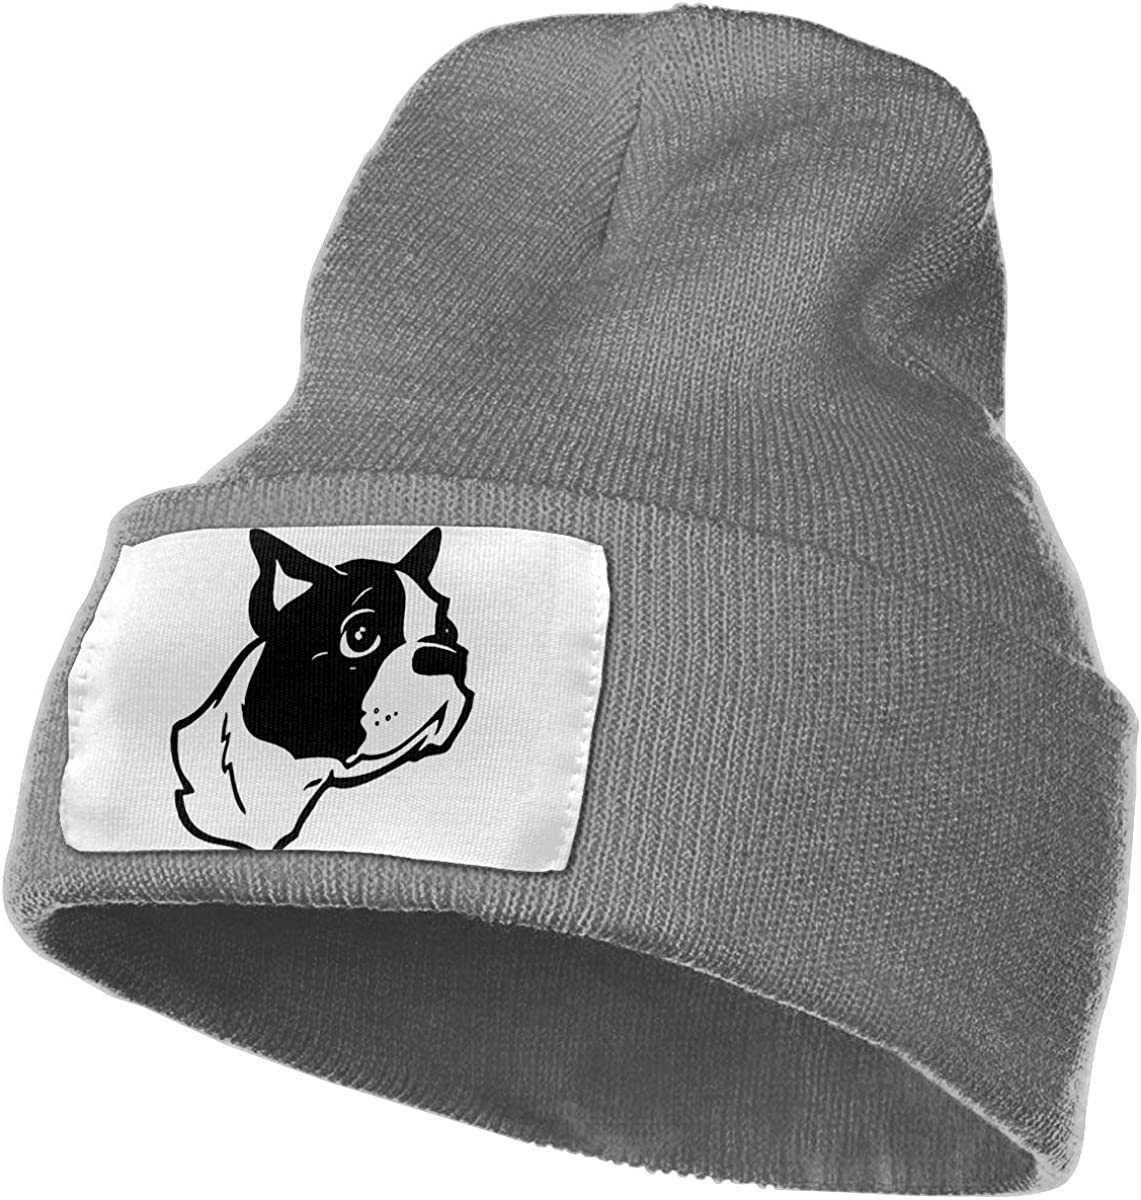 TAOMAP89 Cartoon German Shepherd Men /& Women Skull Caps Winter Warm Stretchy Knitting Beanie Hats